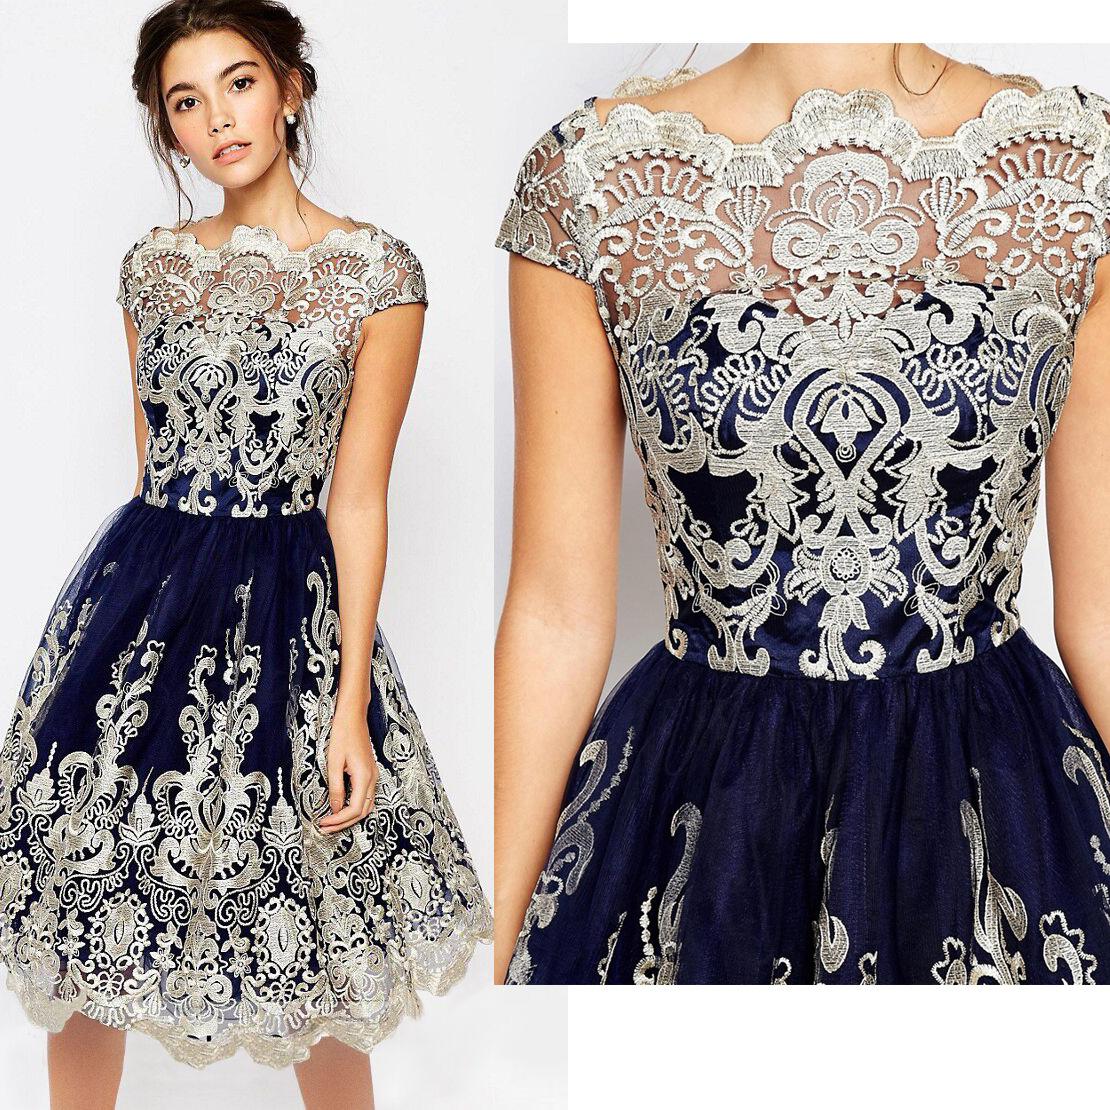 7b617a8ebb1 2017 Elegant Lace Flower Vintage Women Summer Dress Plus Size S~XL ...